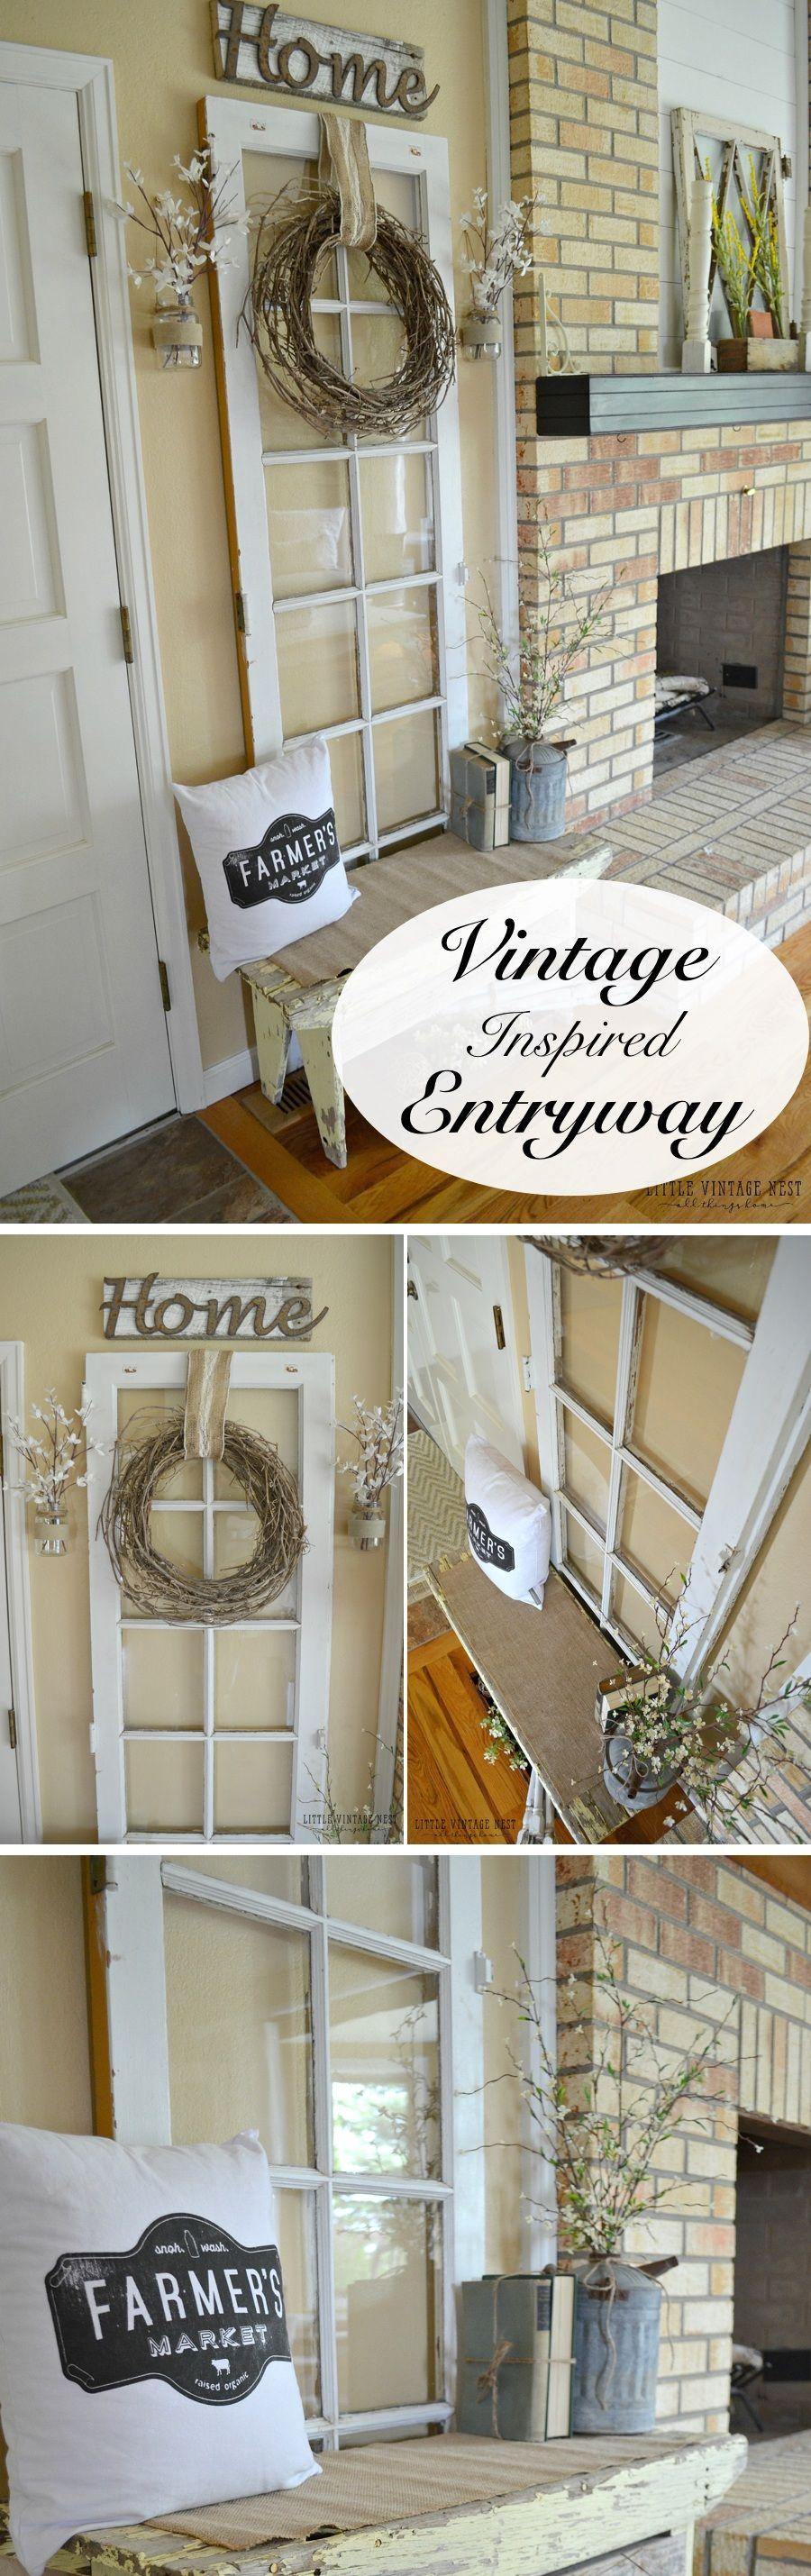 brilliant ways to repurpose old windows vintage window and